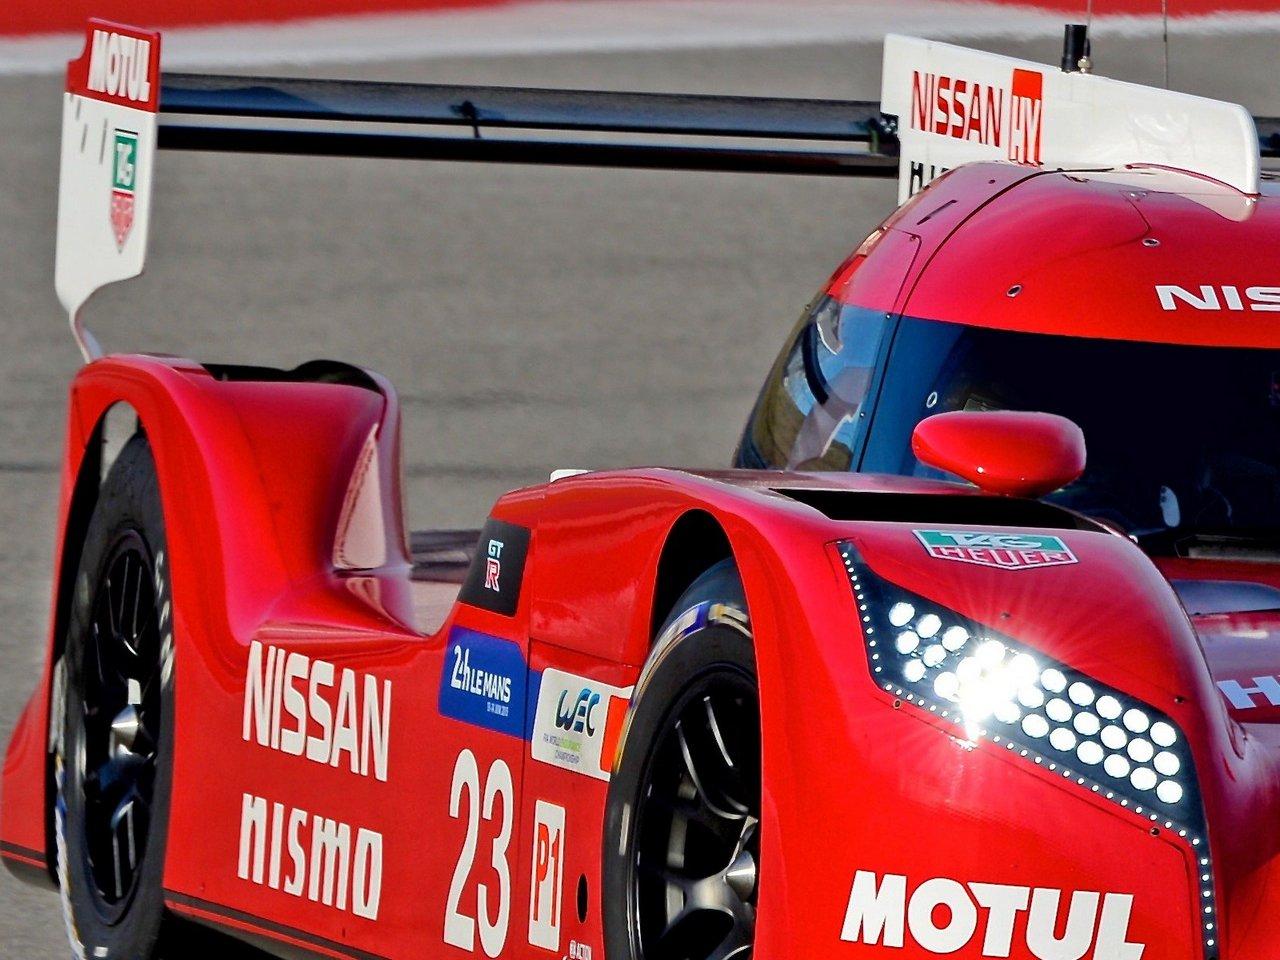 nissan-gt-r_lm-nismo-le-mans-2015-world-endurance-racing-hybrid-0-100_10